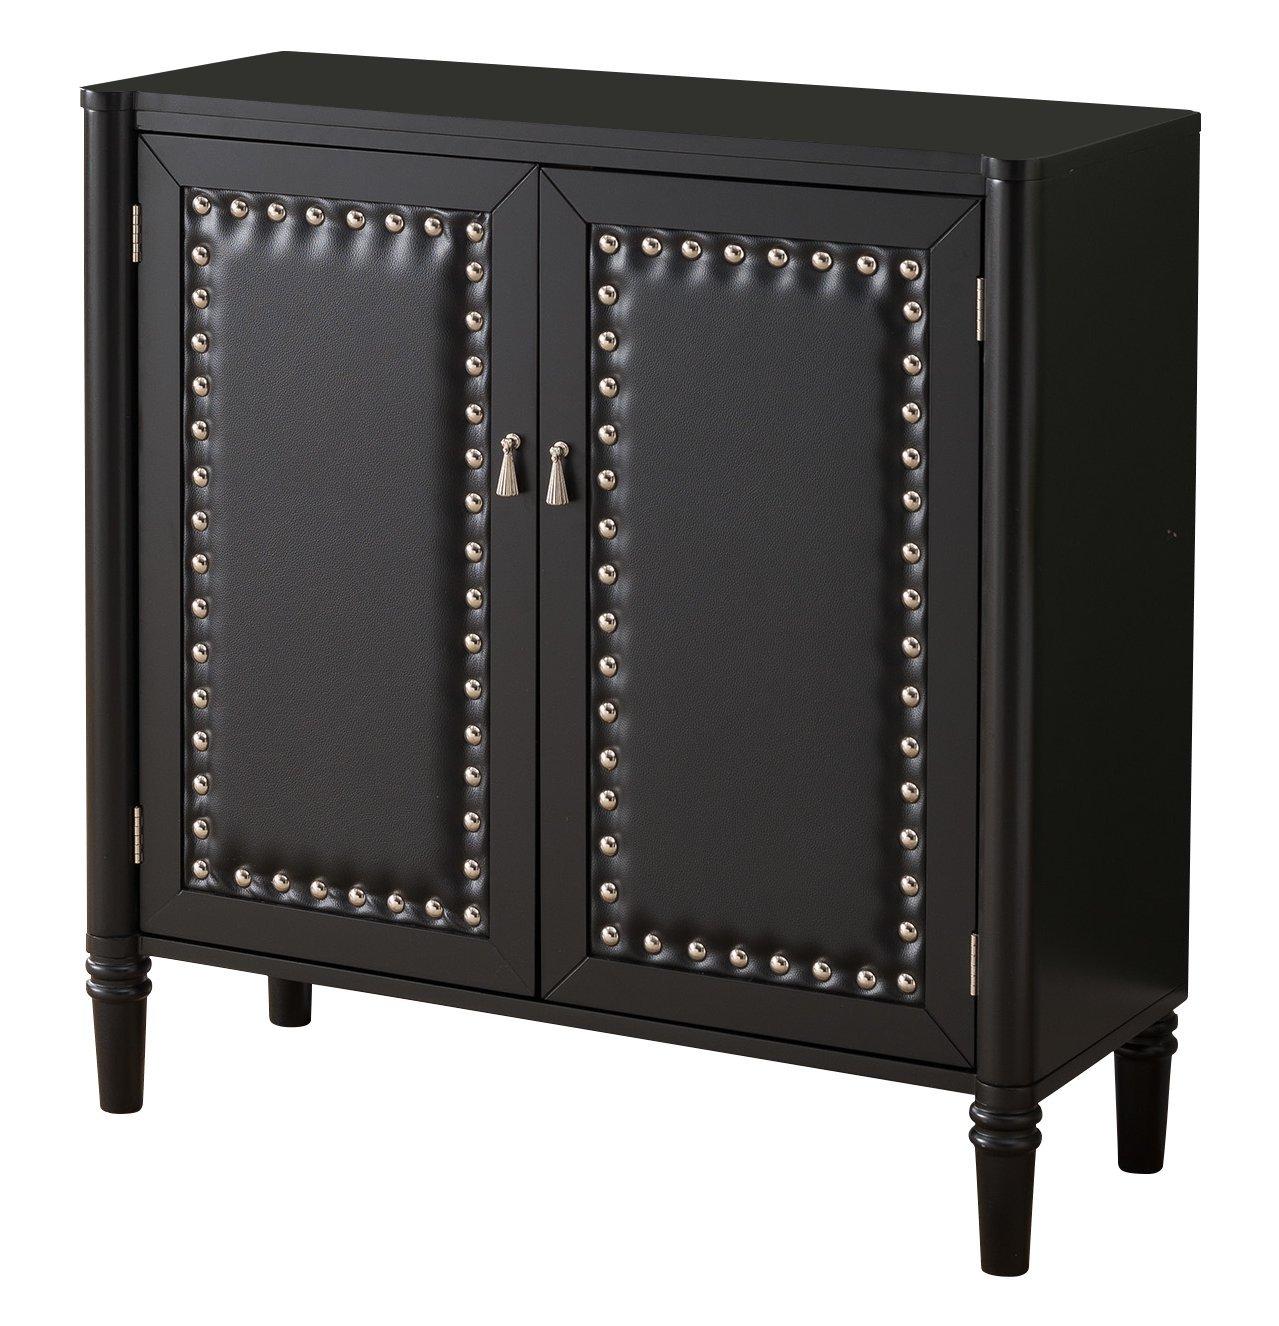 Kings Brand Furniture 2 Door Entryway Console Table Accent Cabinet, Black by Kings Brand Furniture (Image #4)